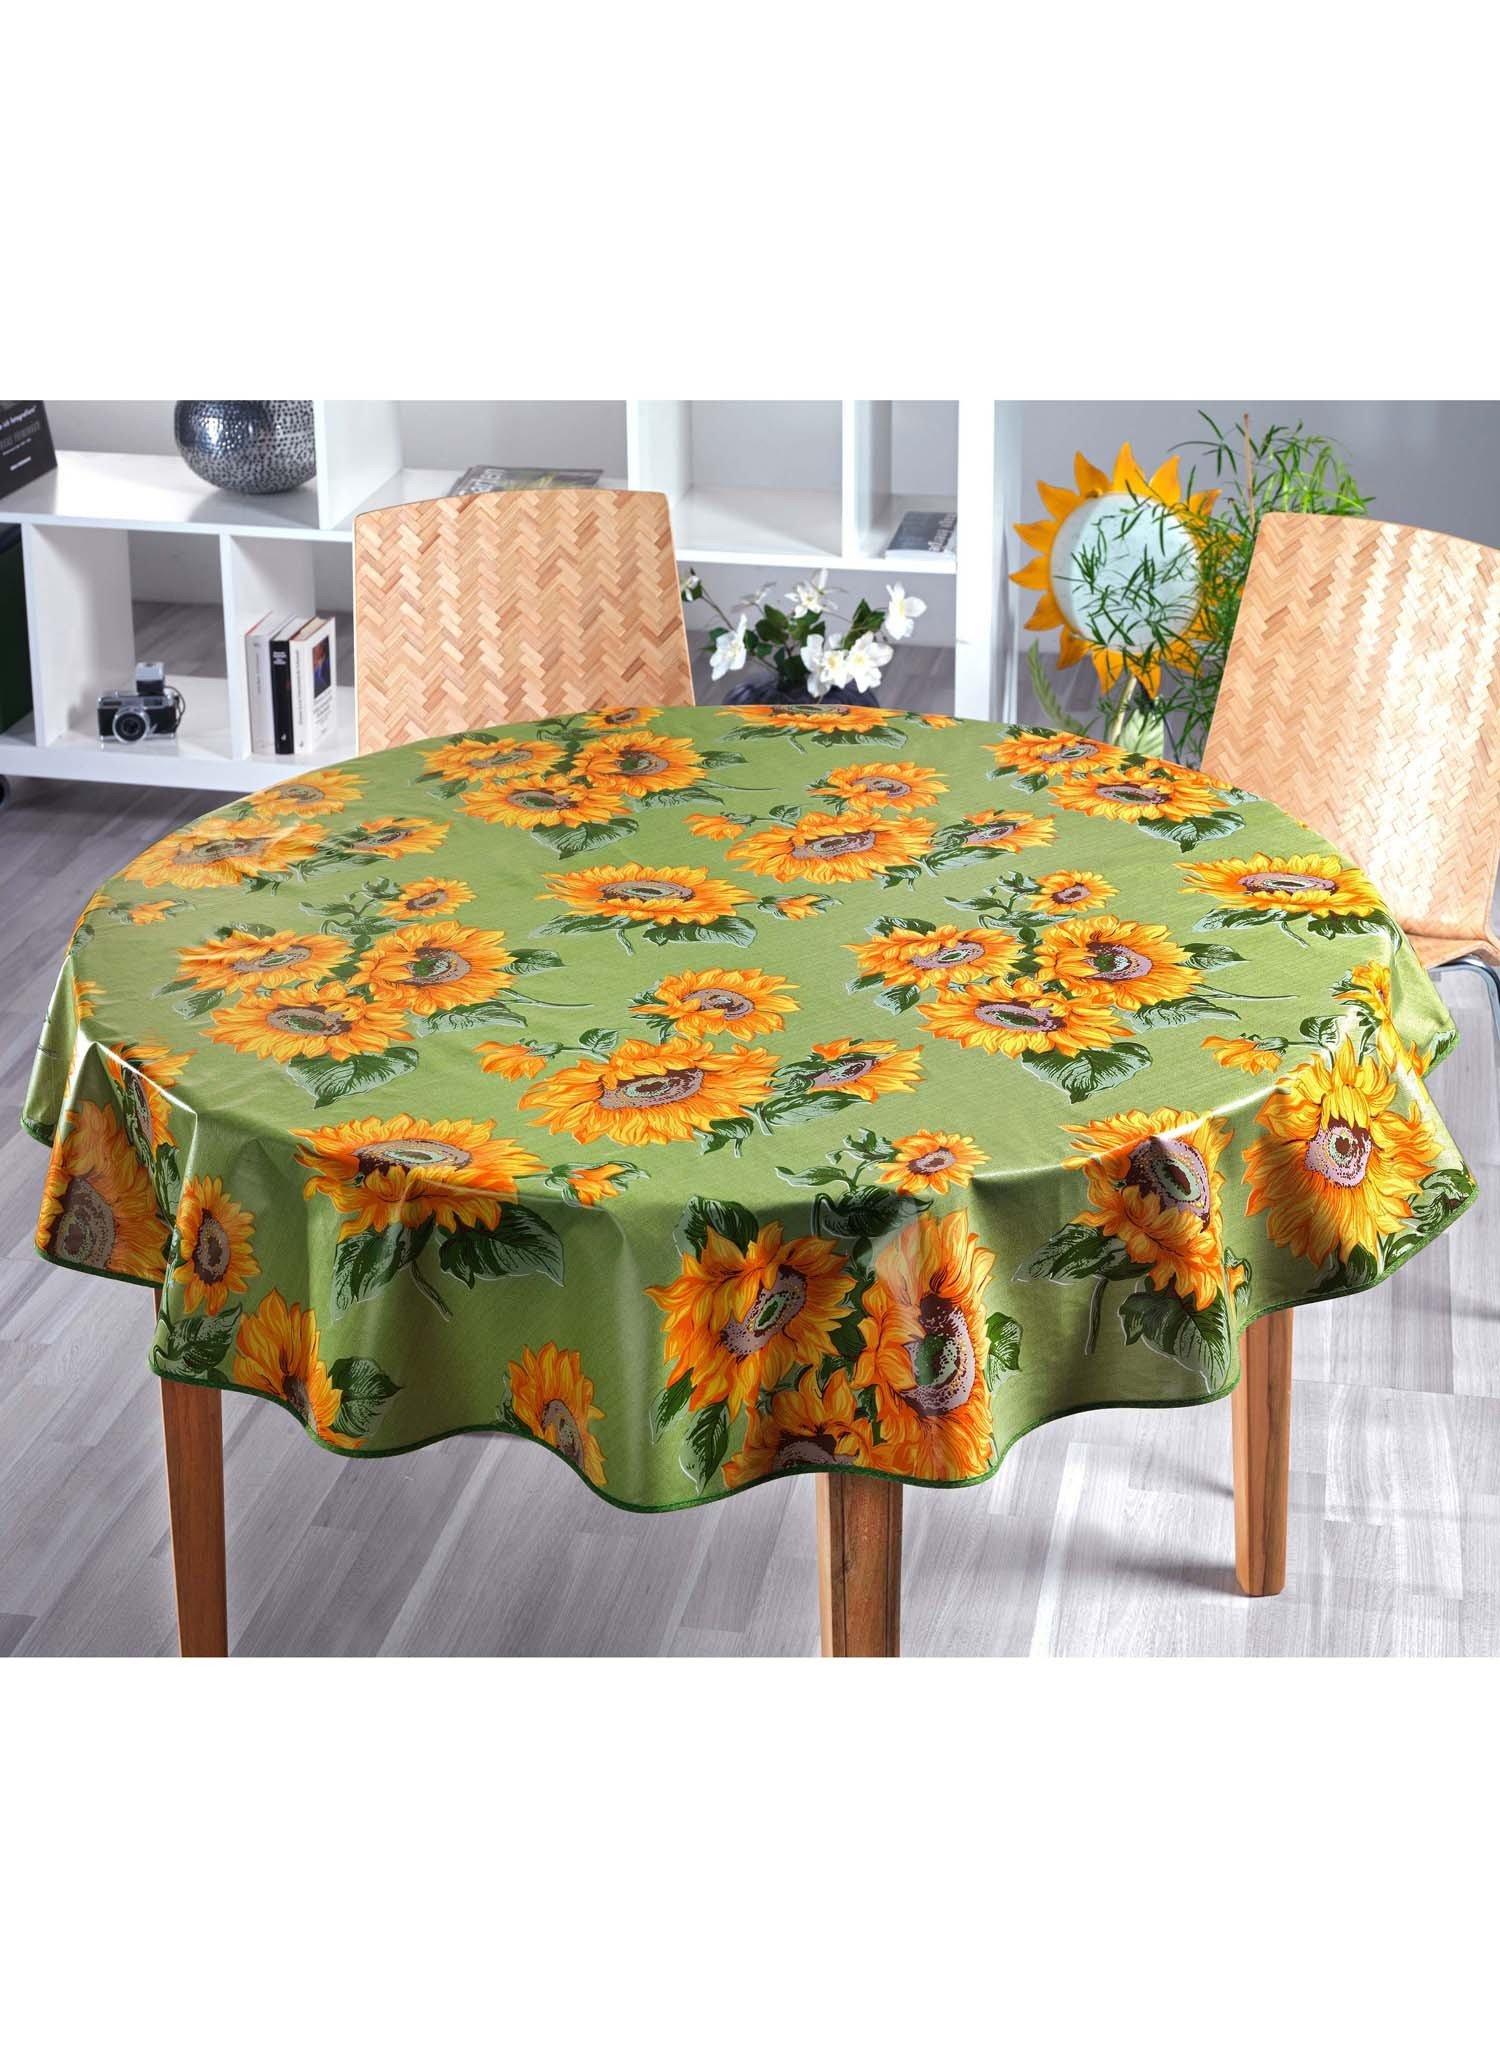 Tisch.Sonnenblume.grün 160cm - 2 - Ronja.ch